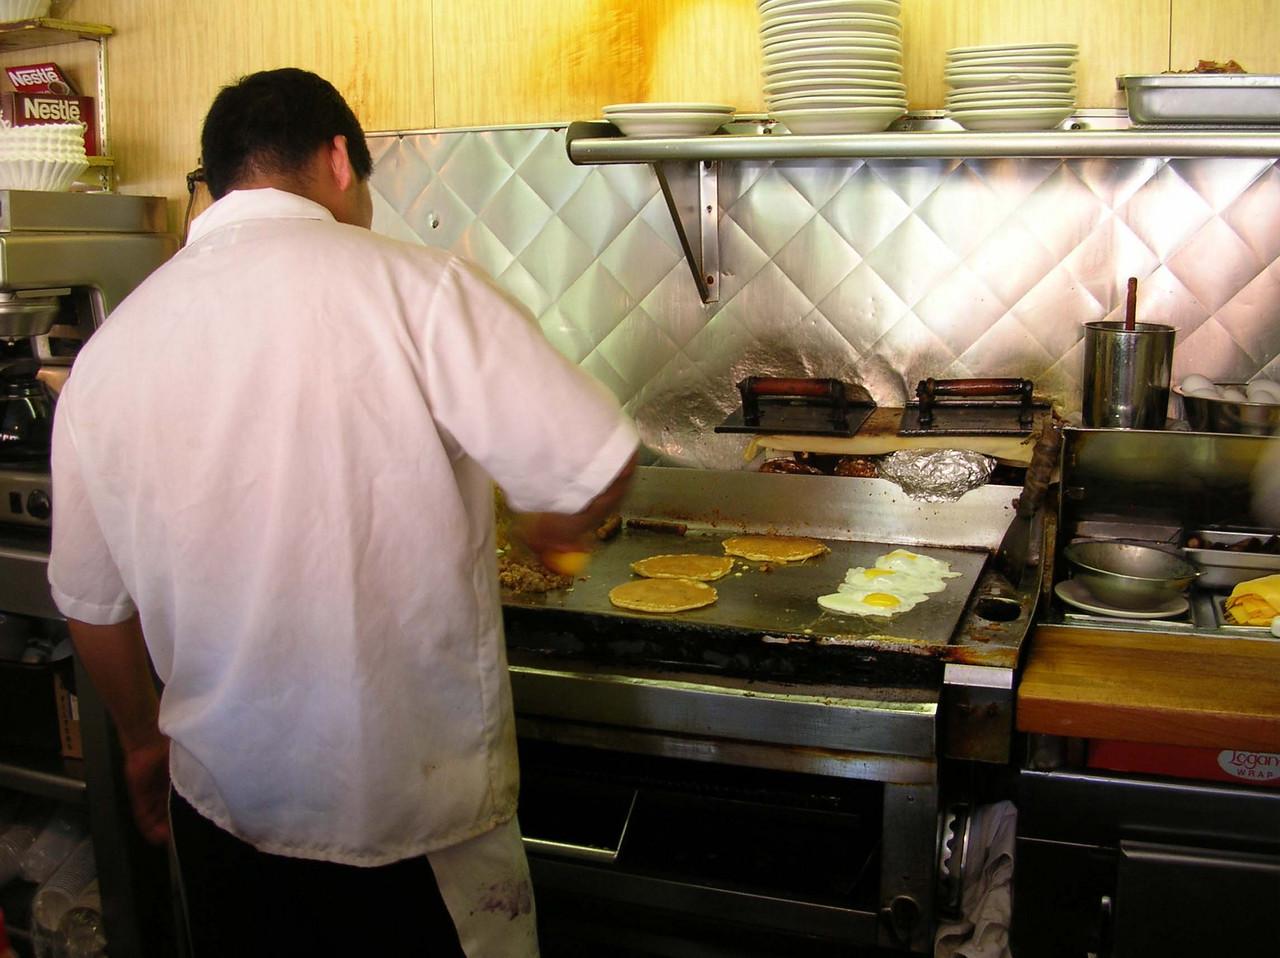 grill cook - Manhattan, 2005